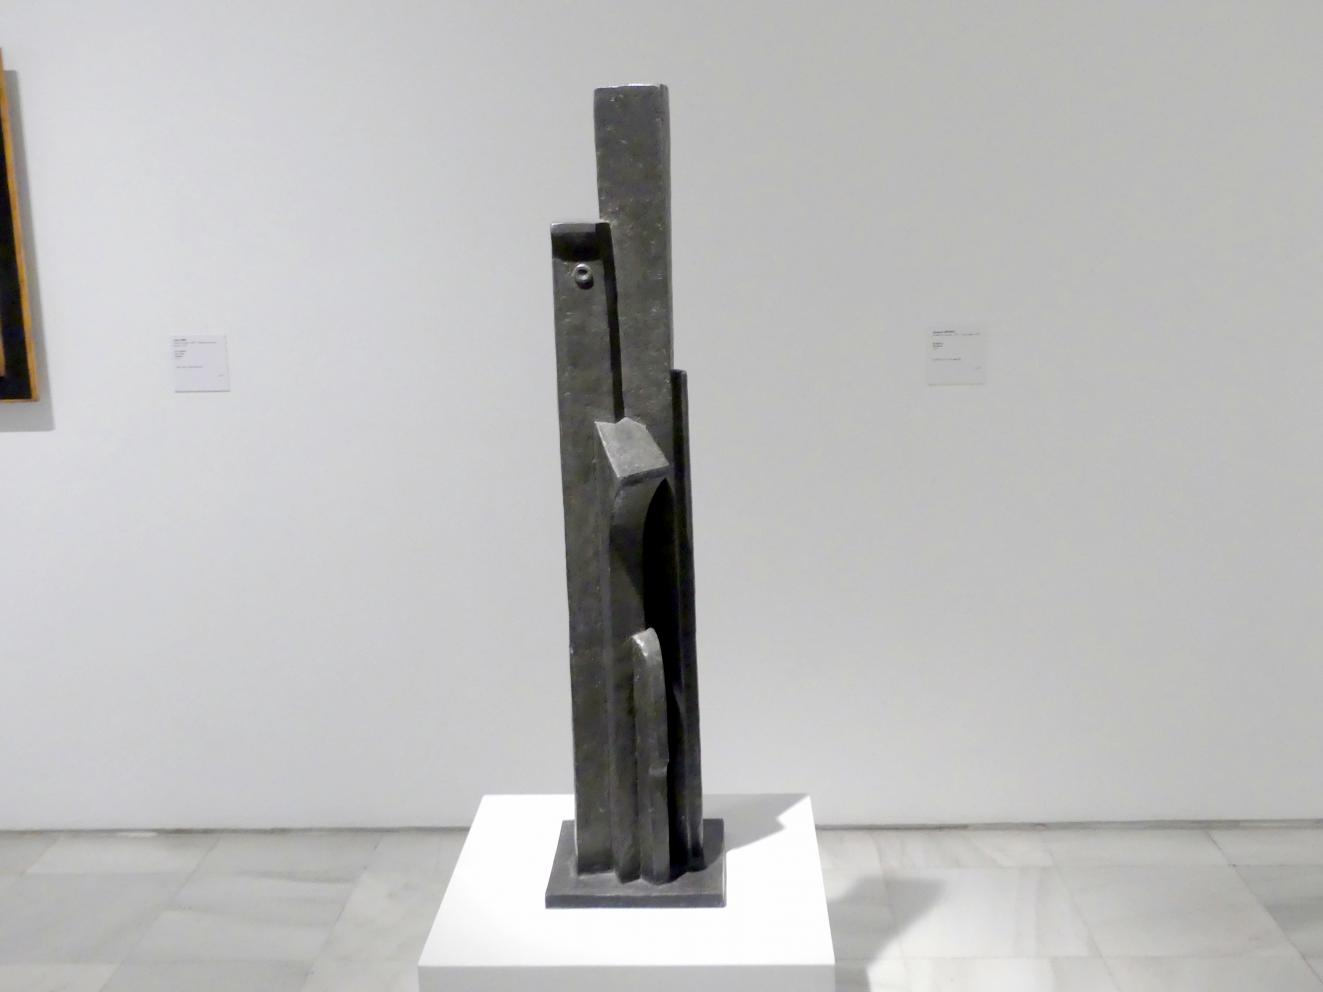 Jacques Lipchitz: Skulptur, 1915